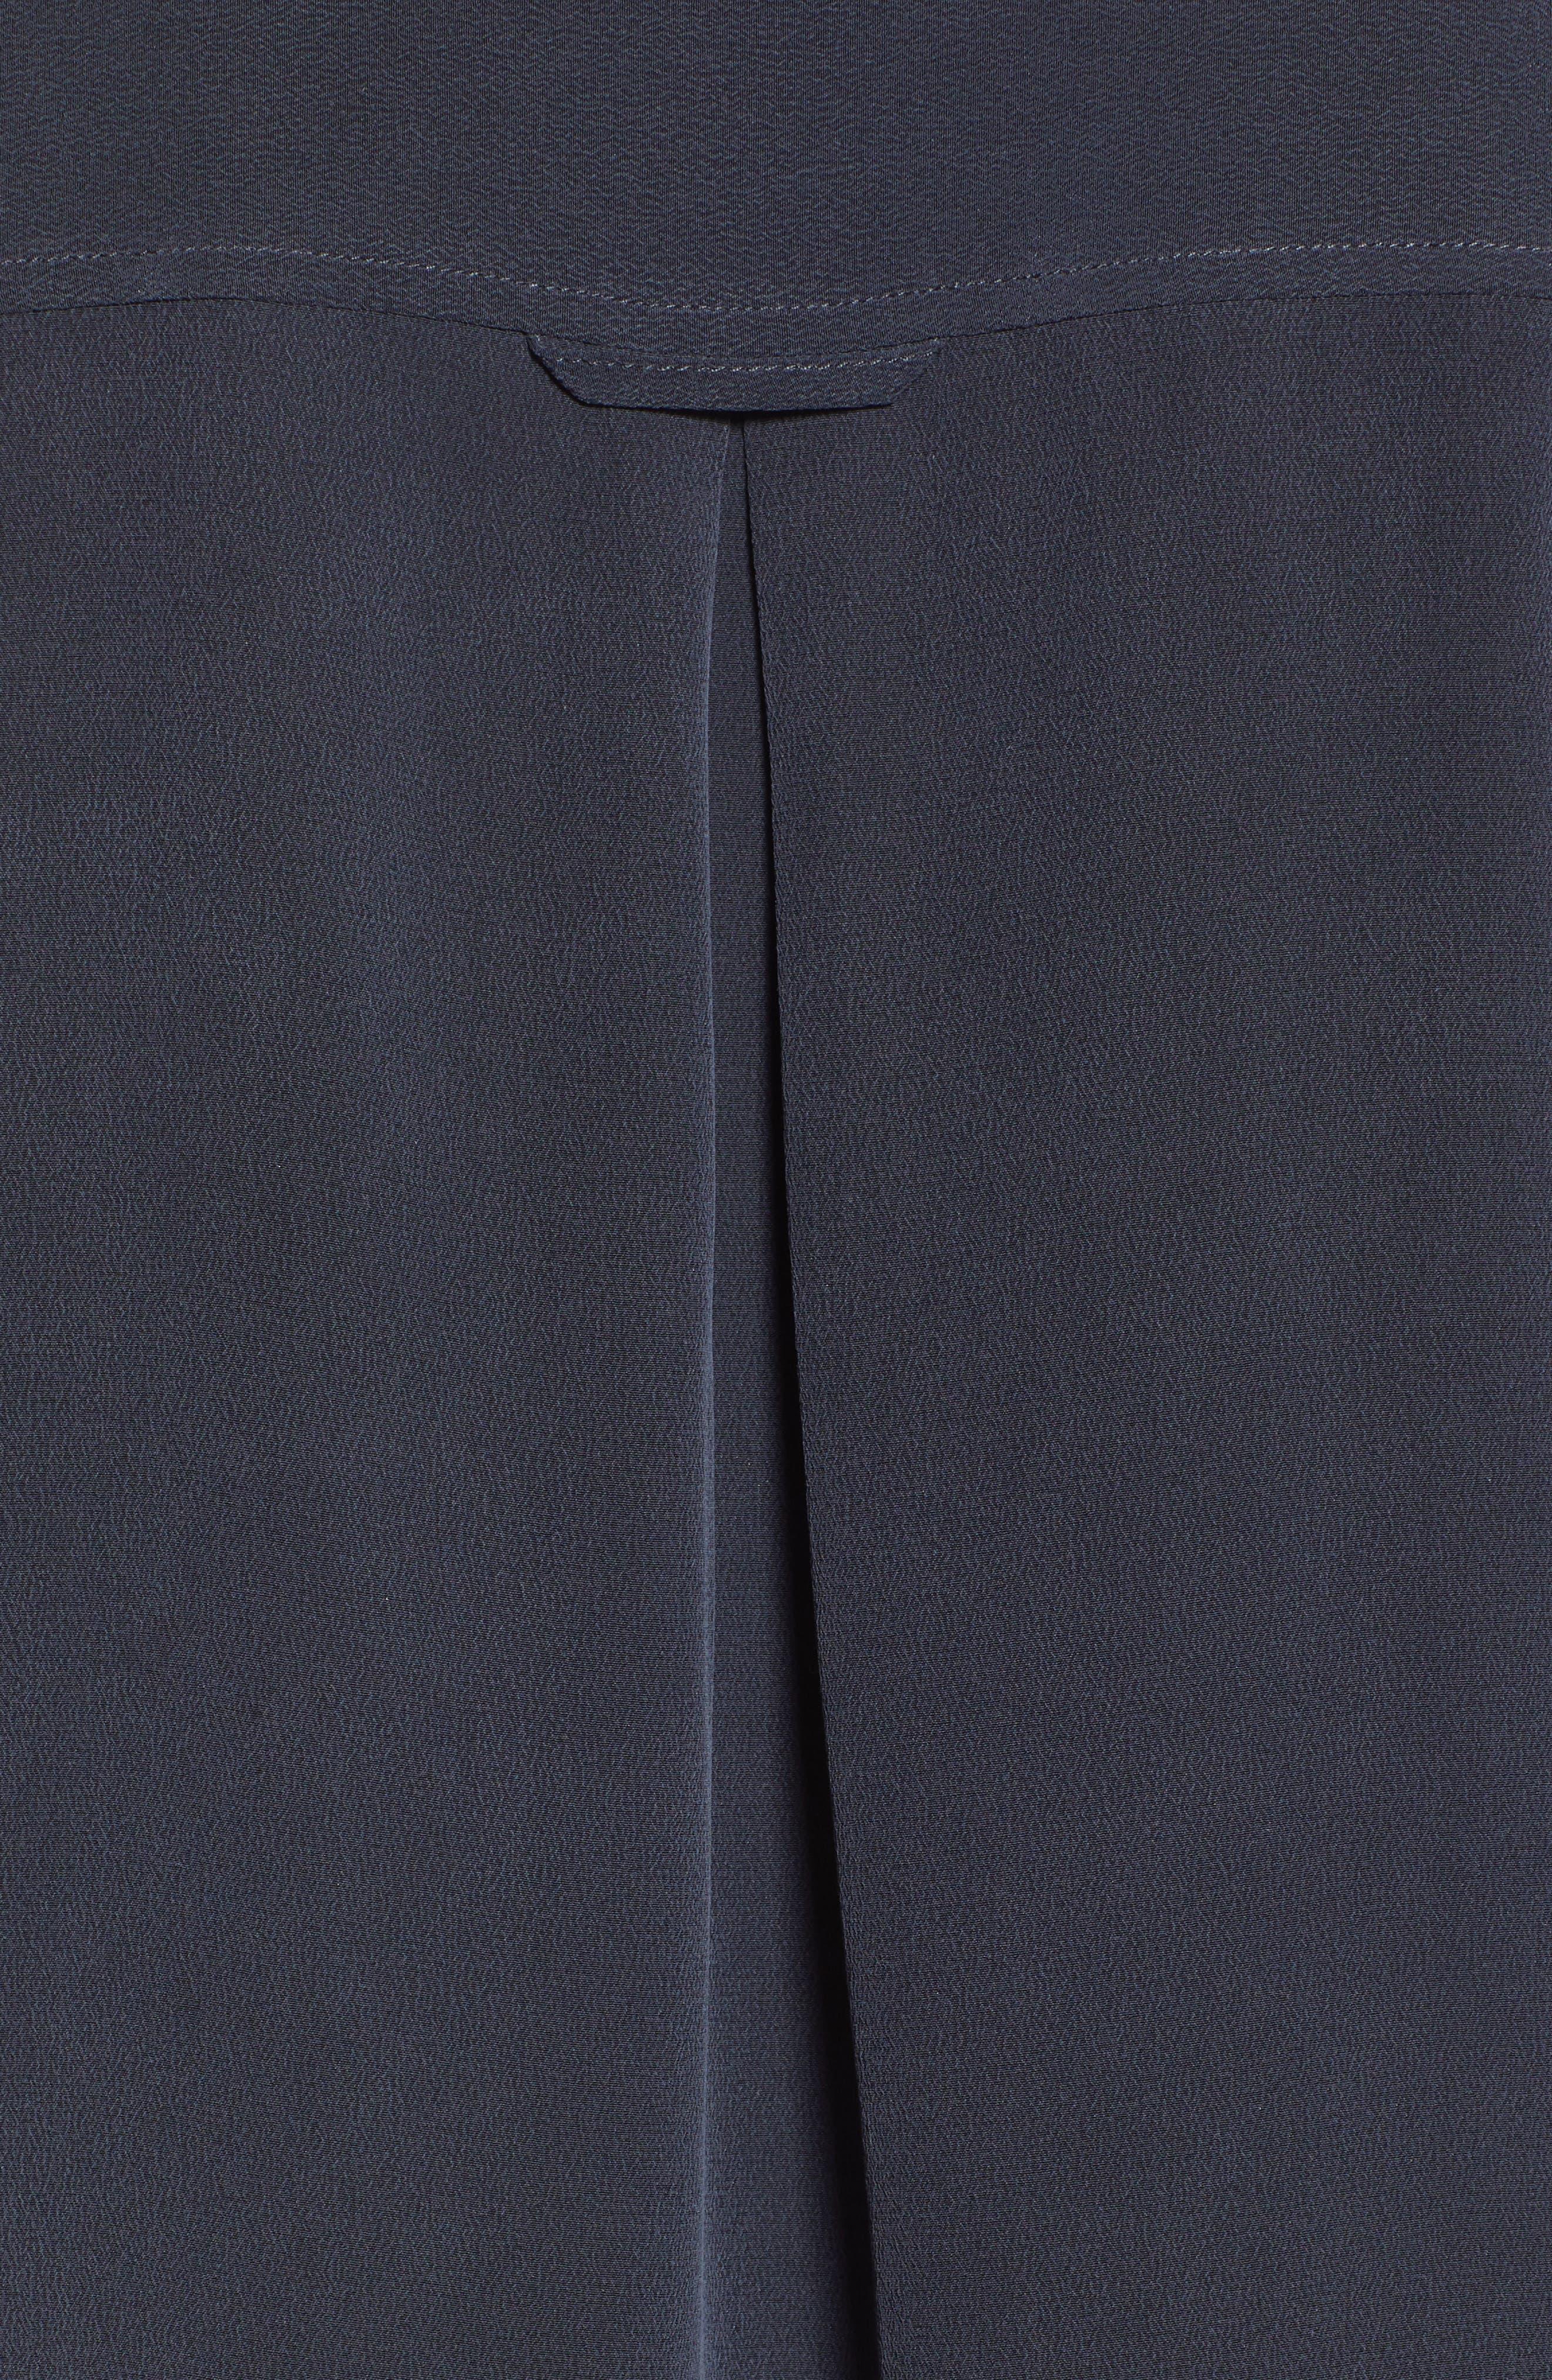 RAILS, Rhett Silk Shirt, Alternate thumbnail 5, color, 021